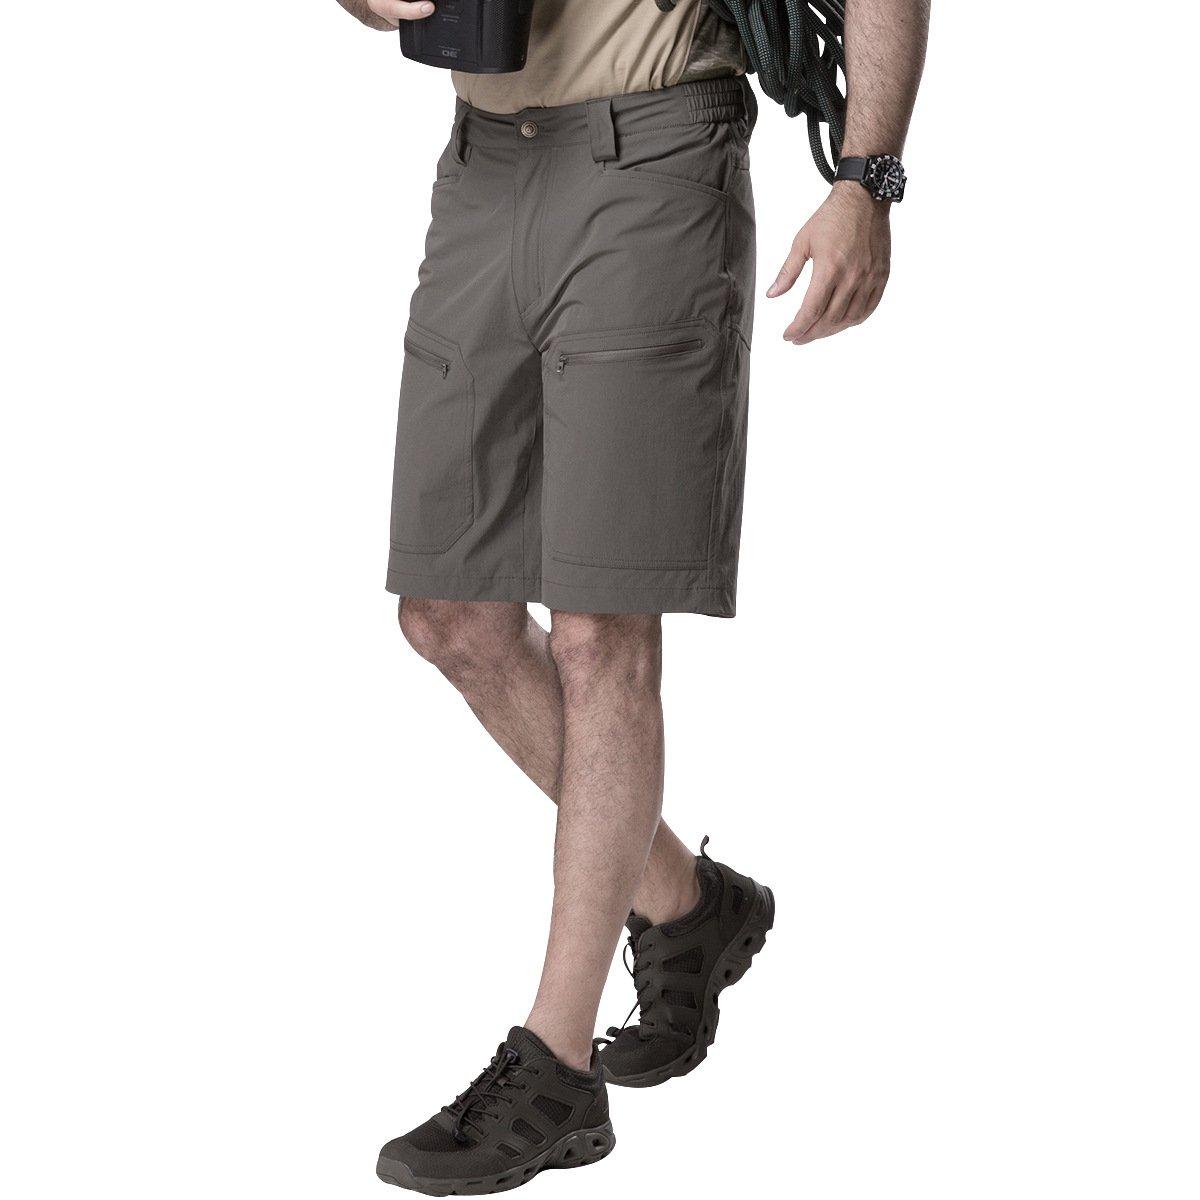 TALLA 34W. Pantalones cortos cargo ultraligeros de secado rápido, elásticos, de nailon